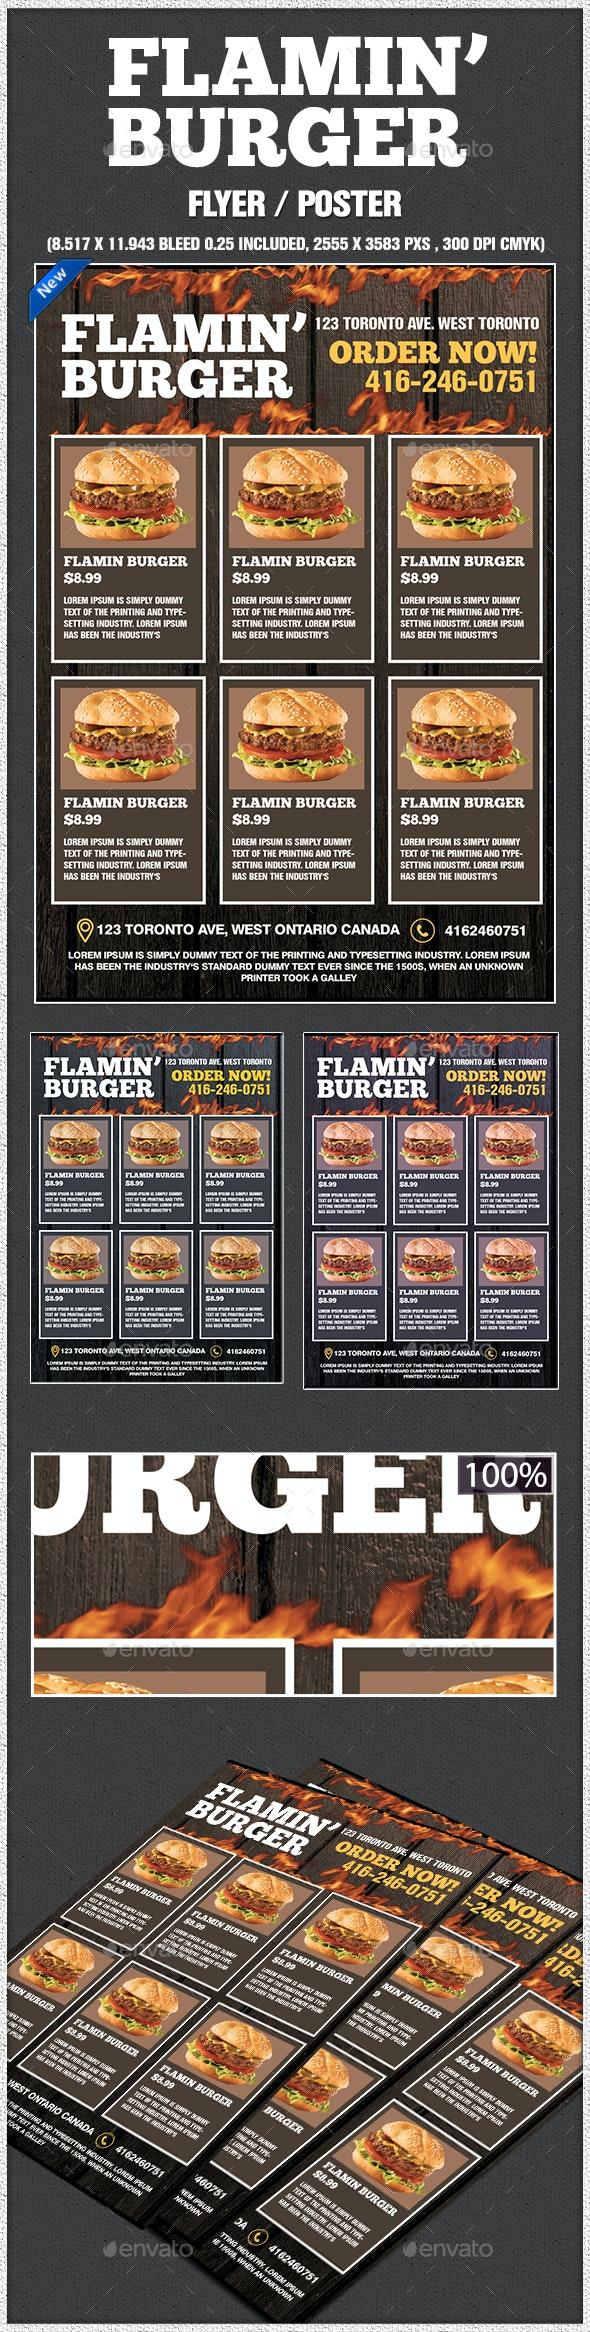 Flamin Burger Poster - Restaurant Flyers